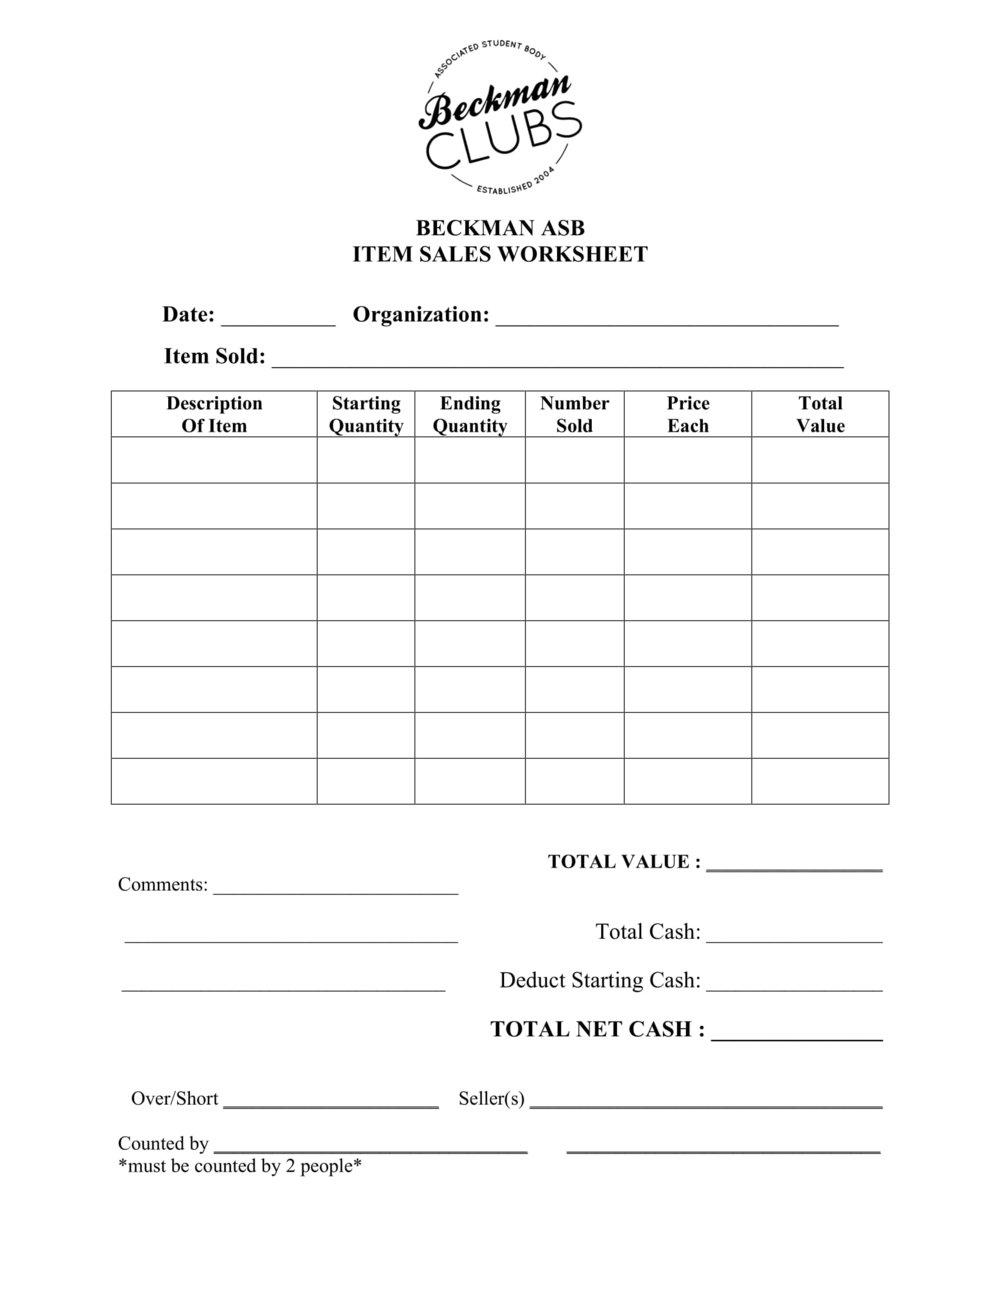 Item Inventory Form-1.jpg